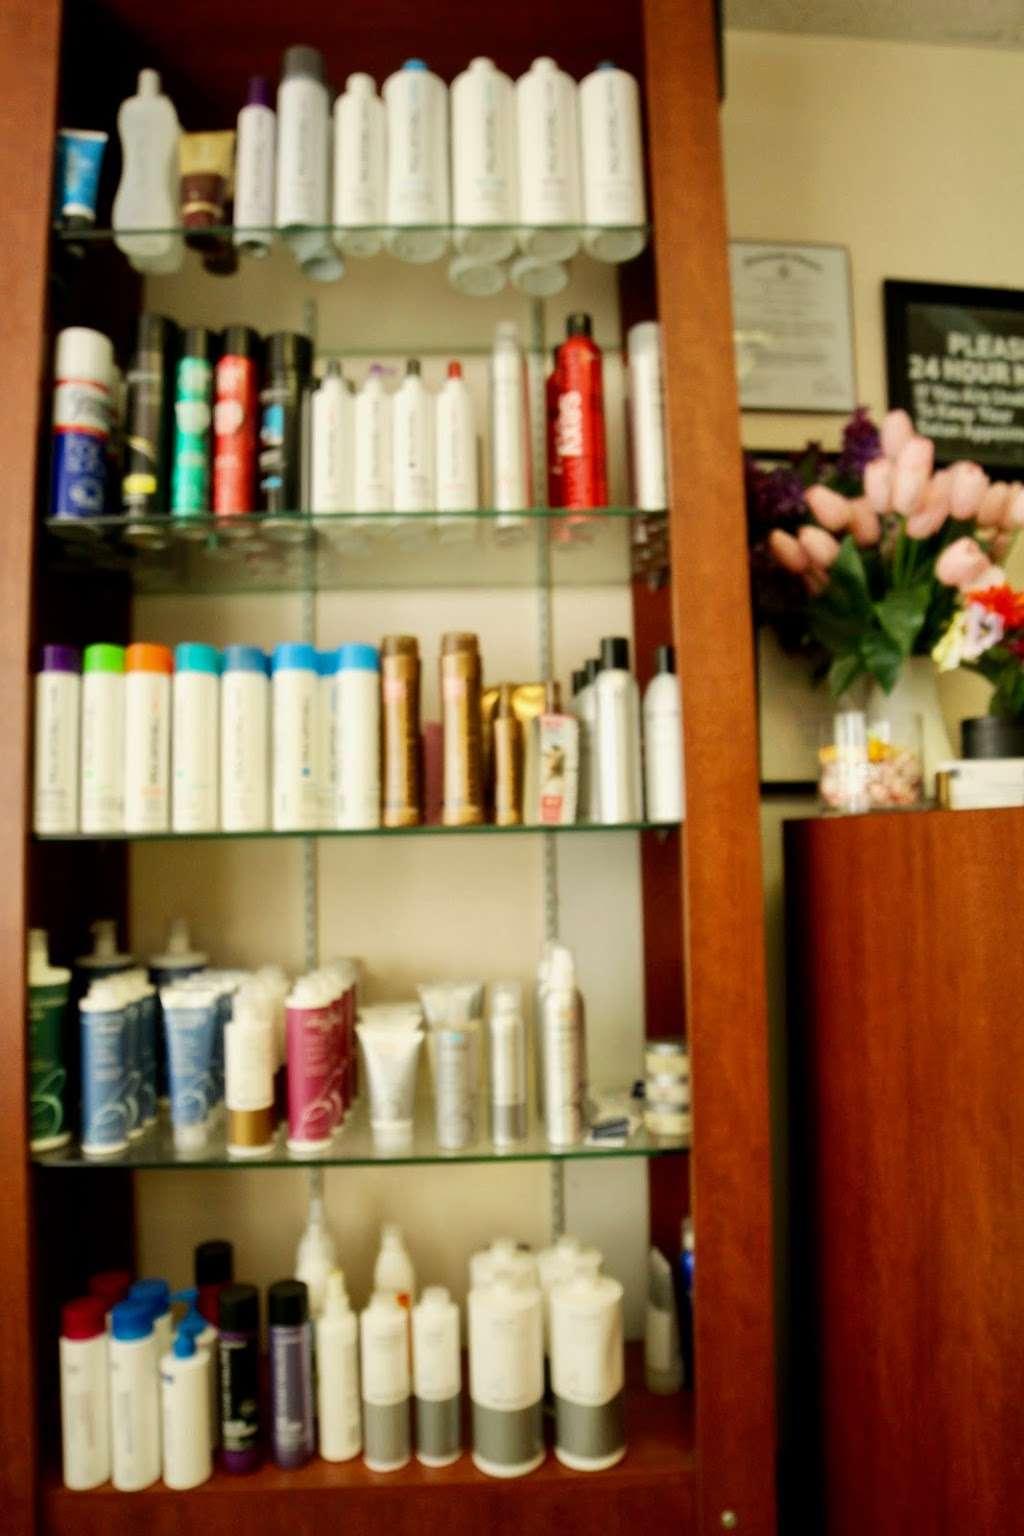 Fort Hunt Hair Design - hair care    Photo 7 of 8   Address: 2406, 1900 Elkin St # 1, Alexandria, VA 22308, USA   Phone: (703) 780-1671